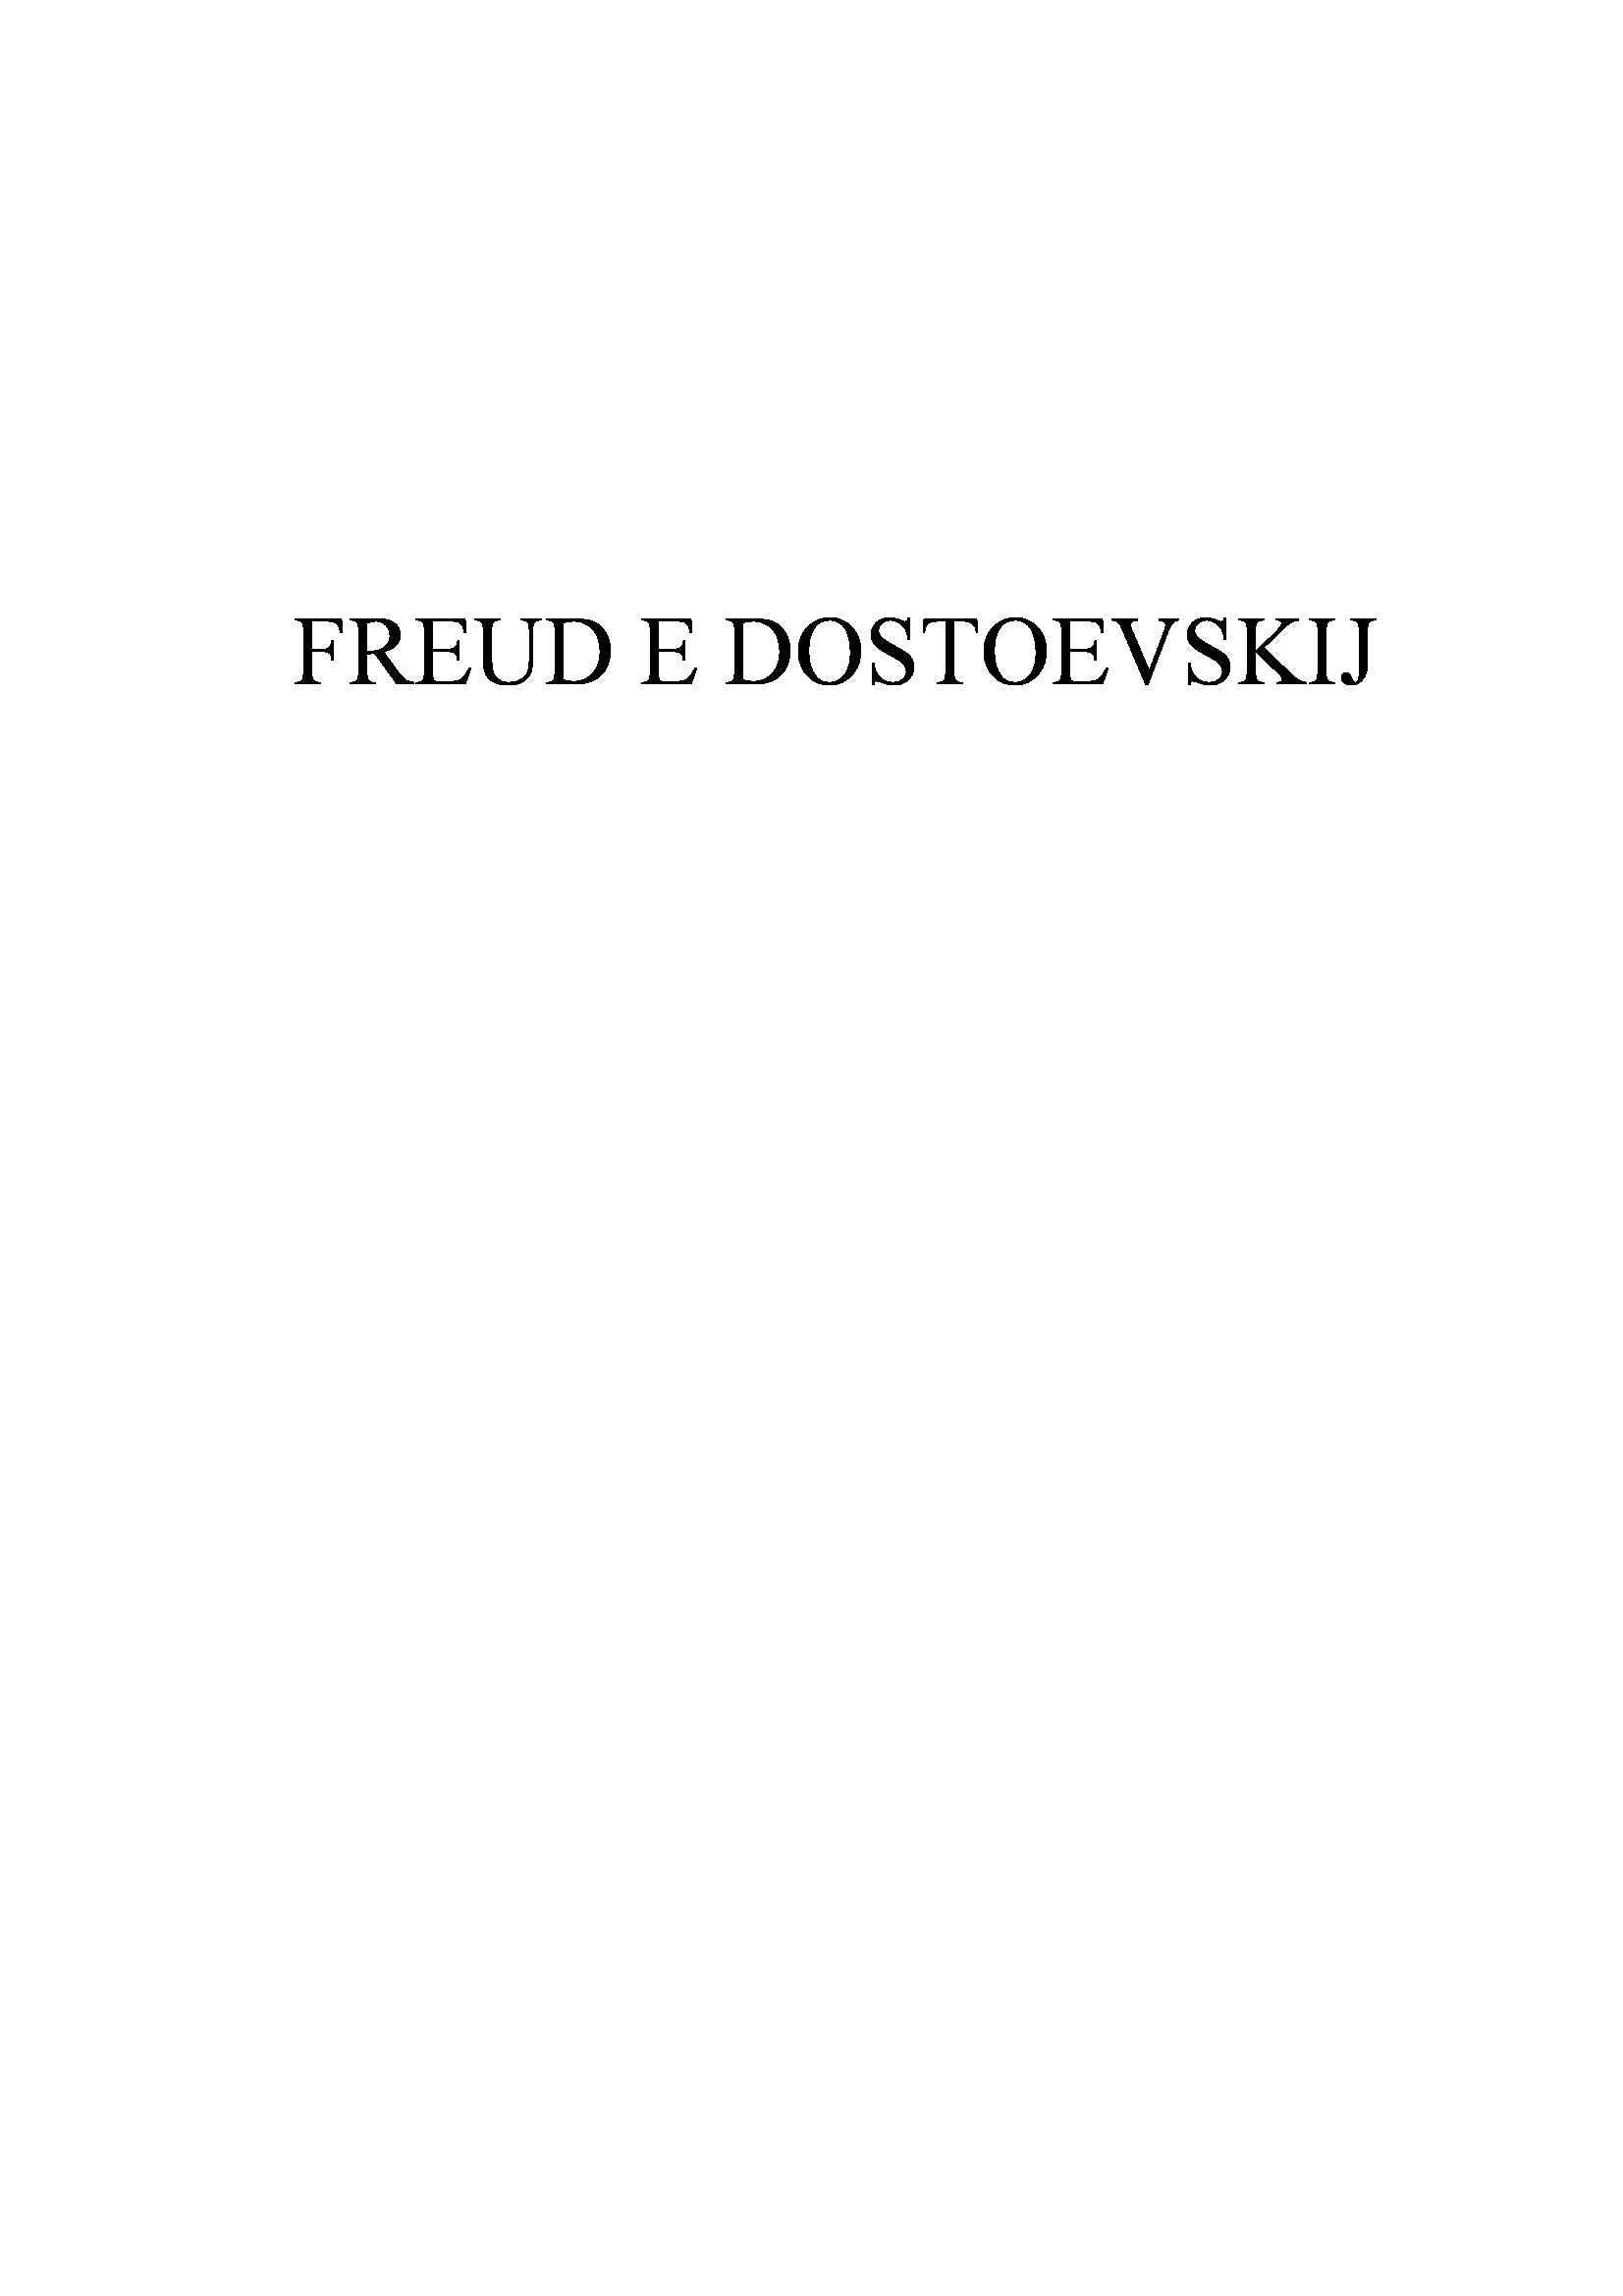 Tesi - Psicologia in letteratura: Dostoevsky